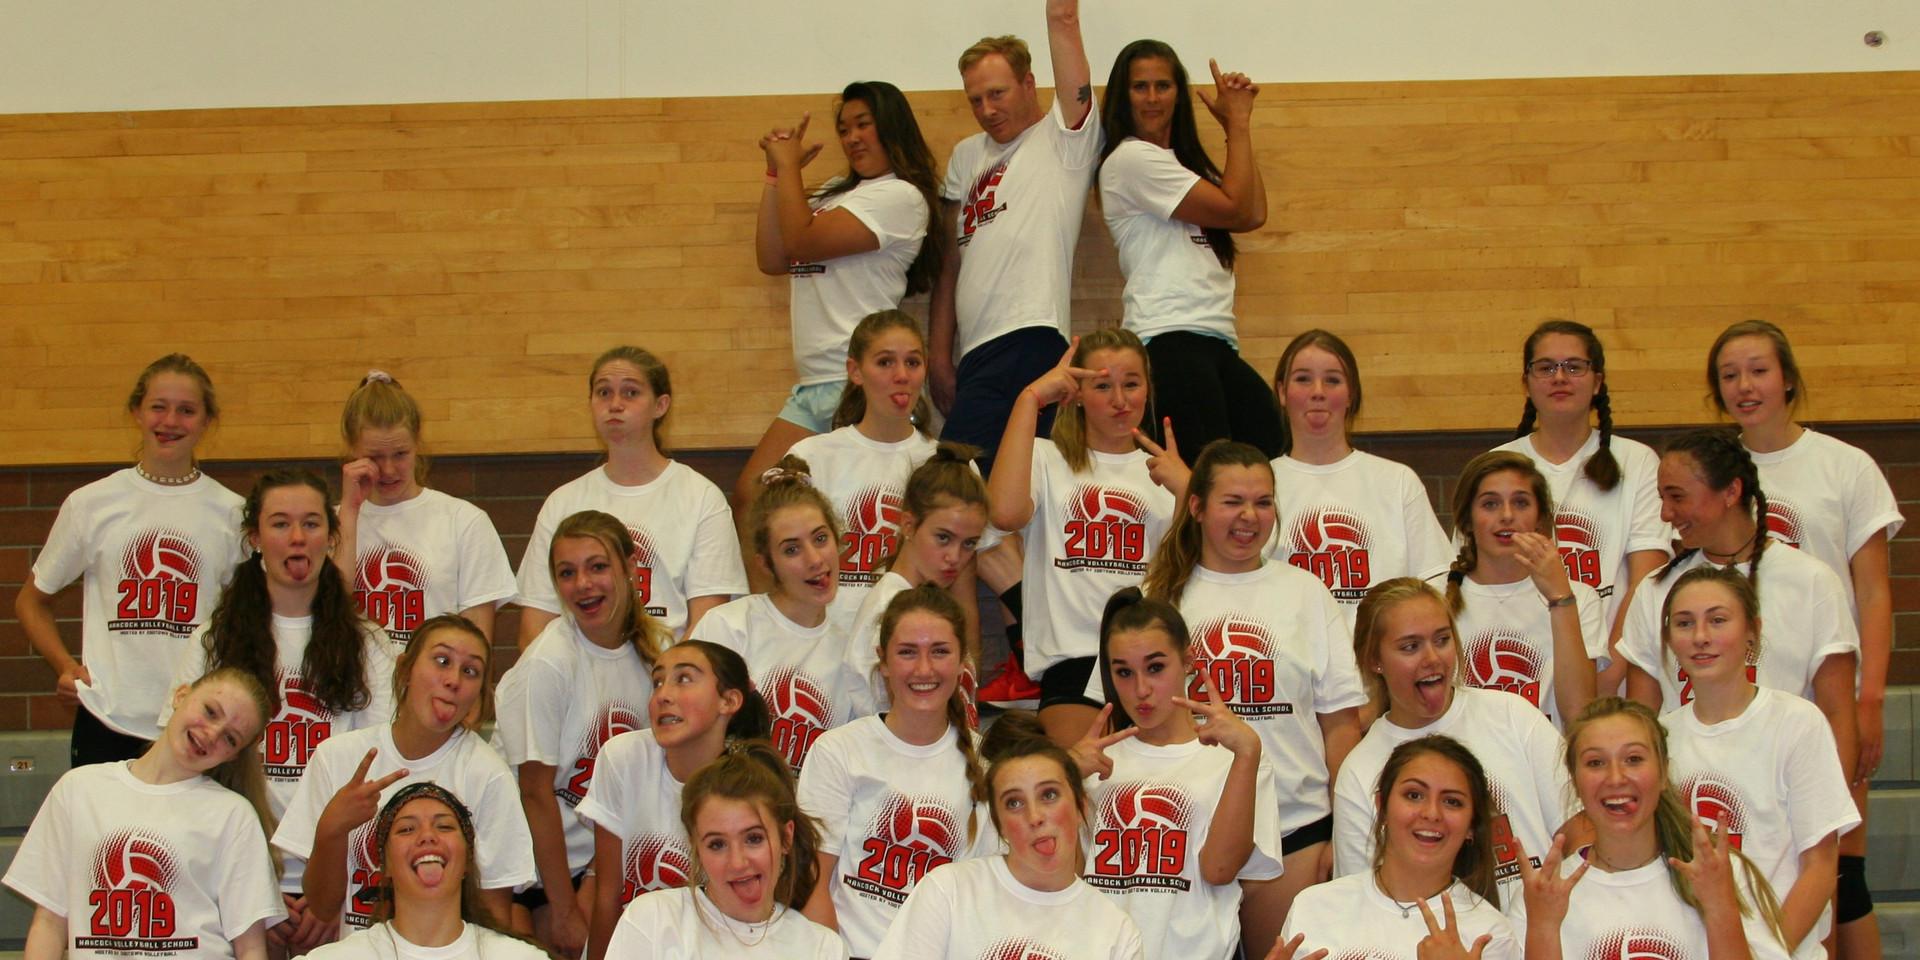 2019 Volleyball School - HS Camp Fun